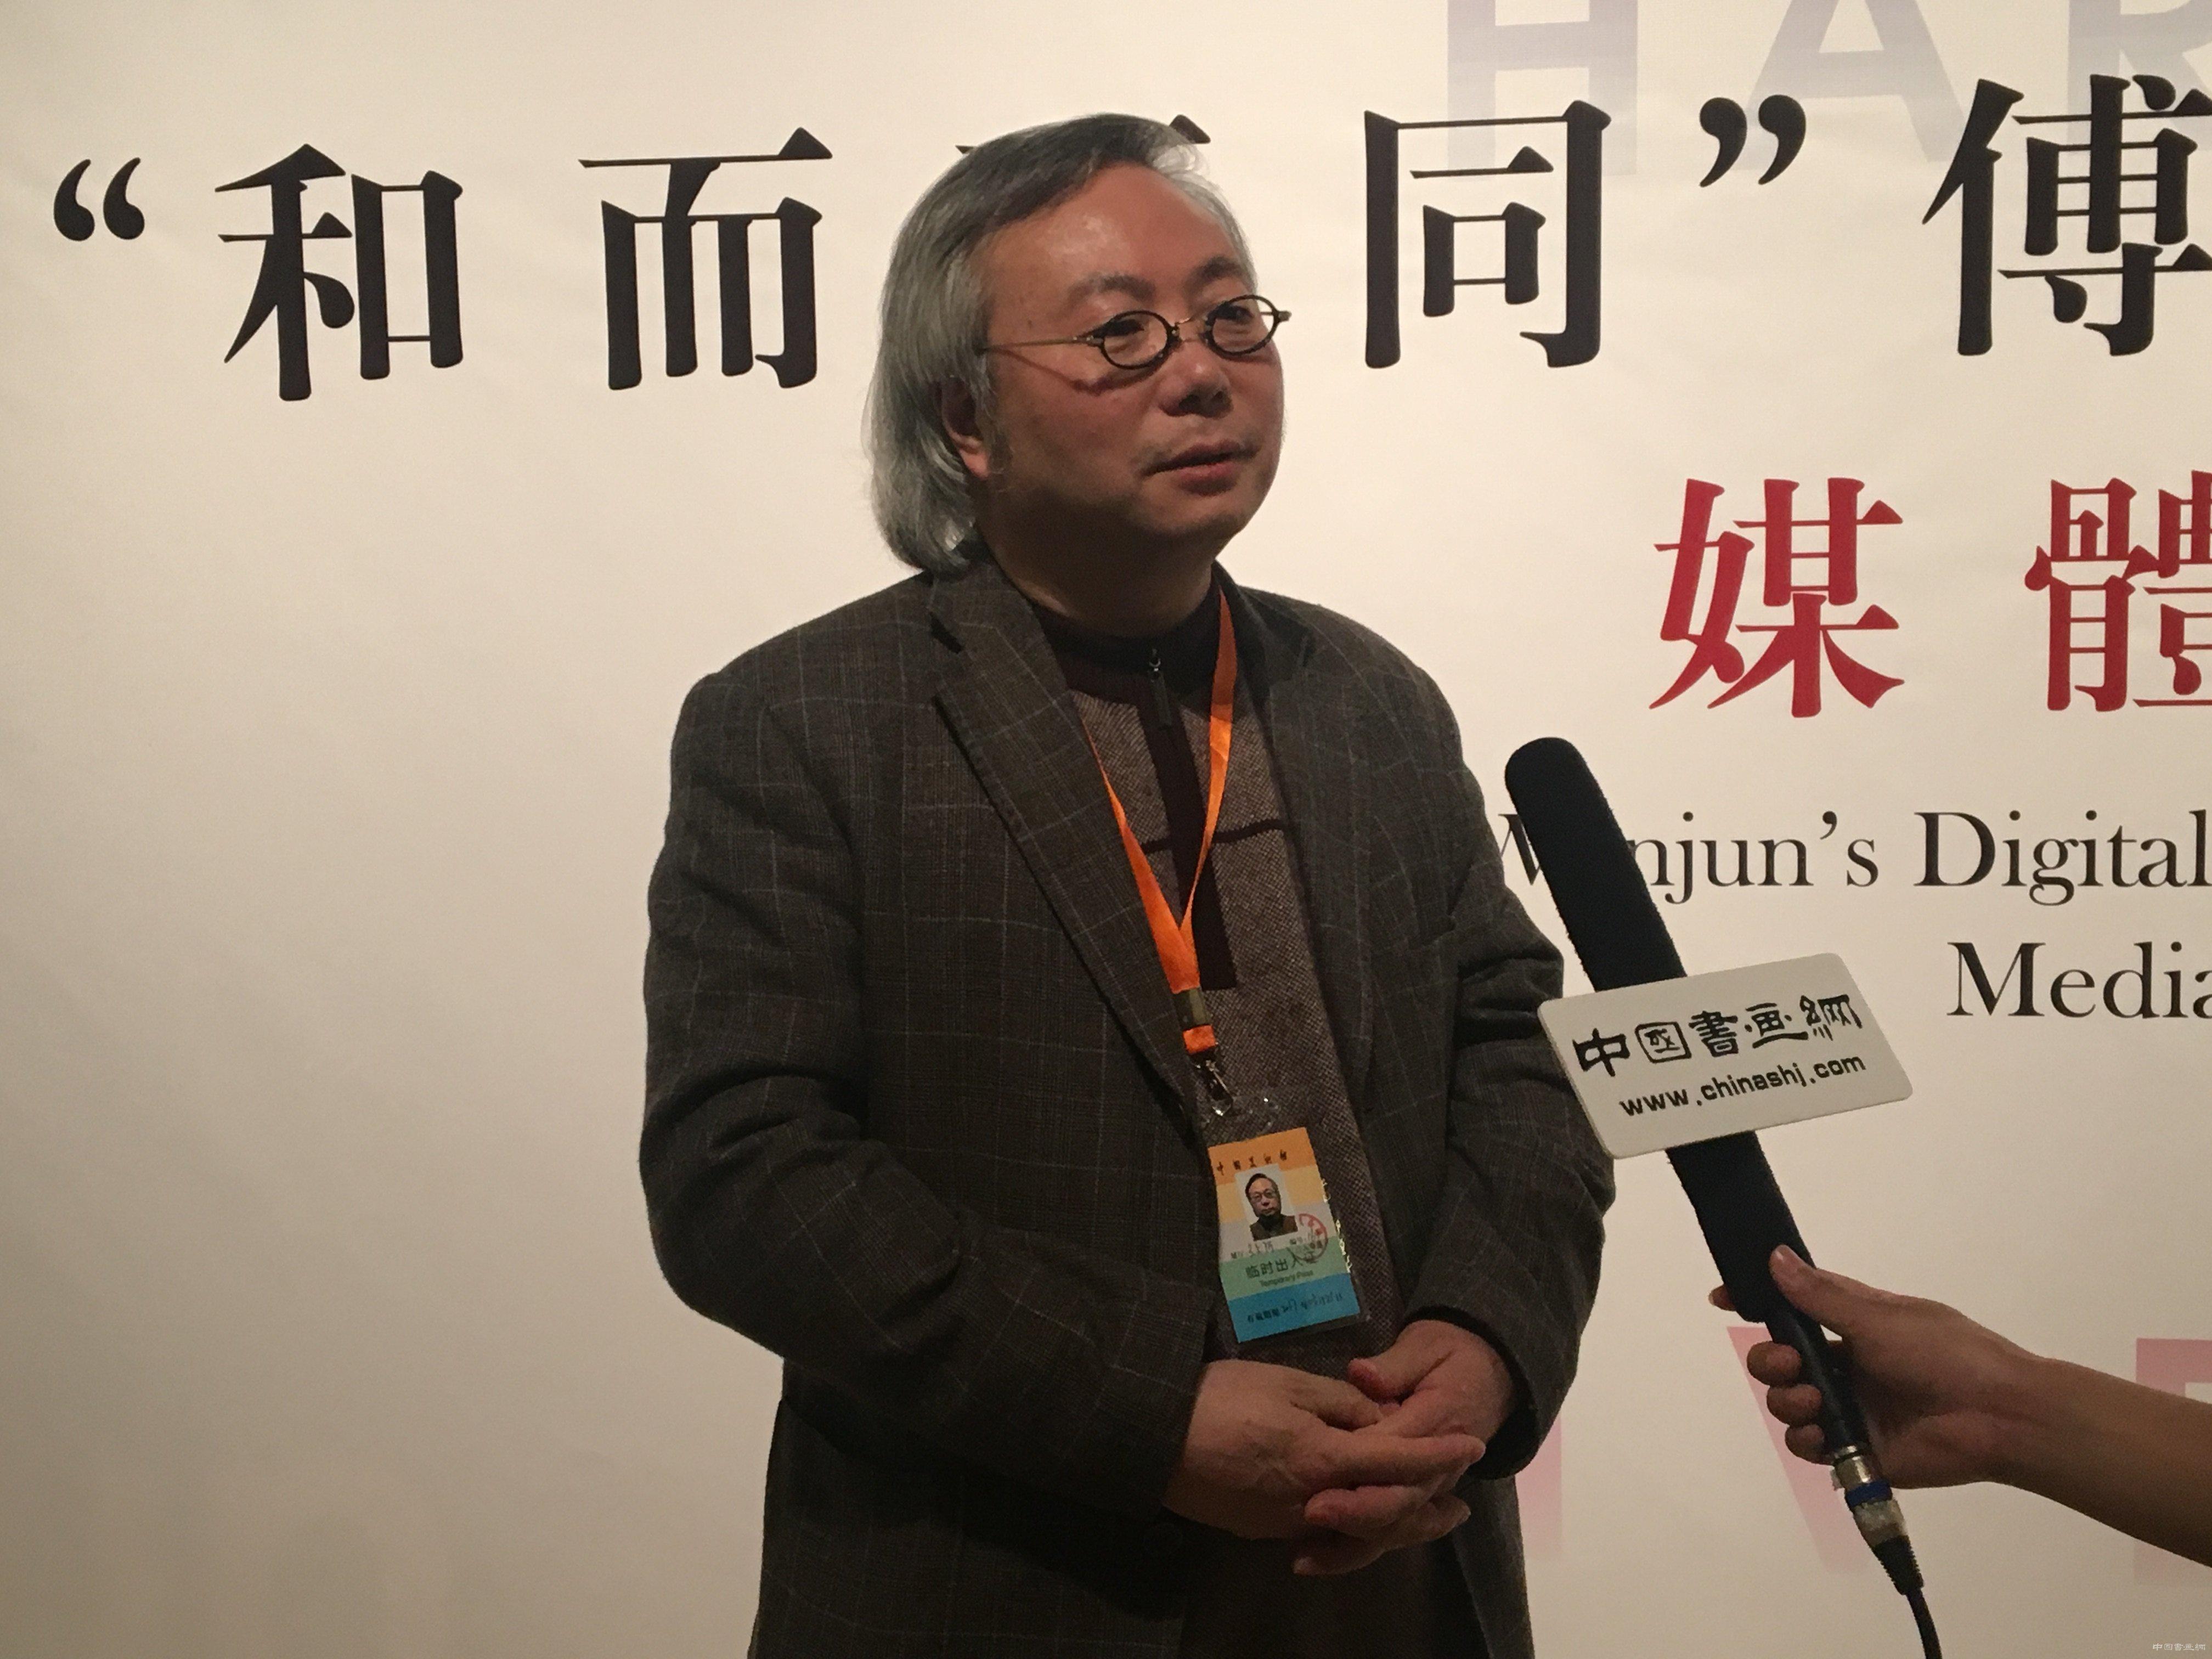 "<strong>""和而不同:傅文俊数绘摄影展""在中国美术馆</strong>"